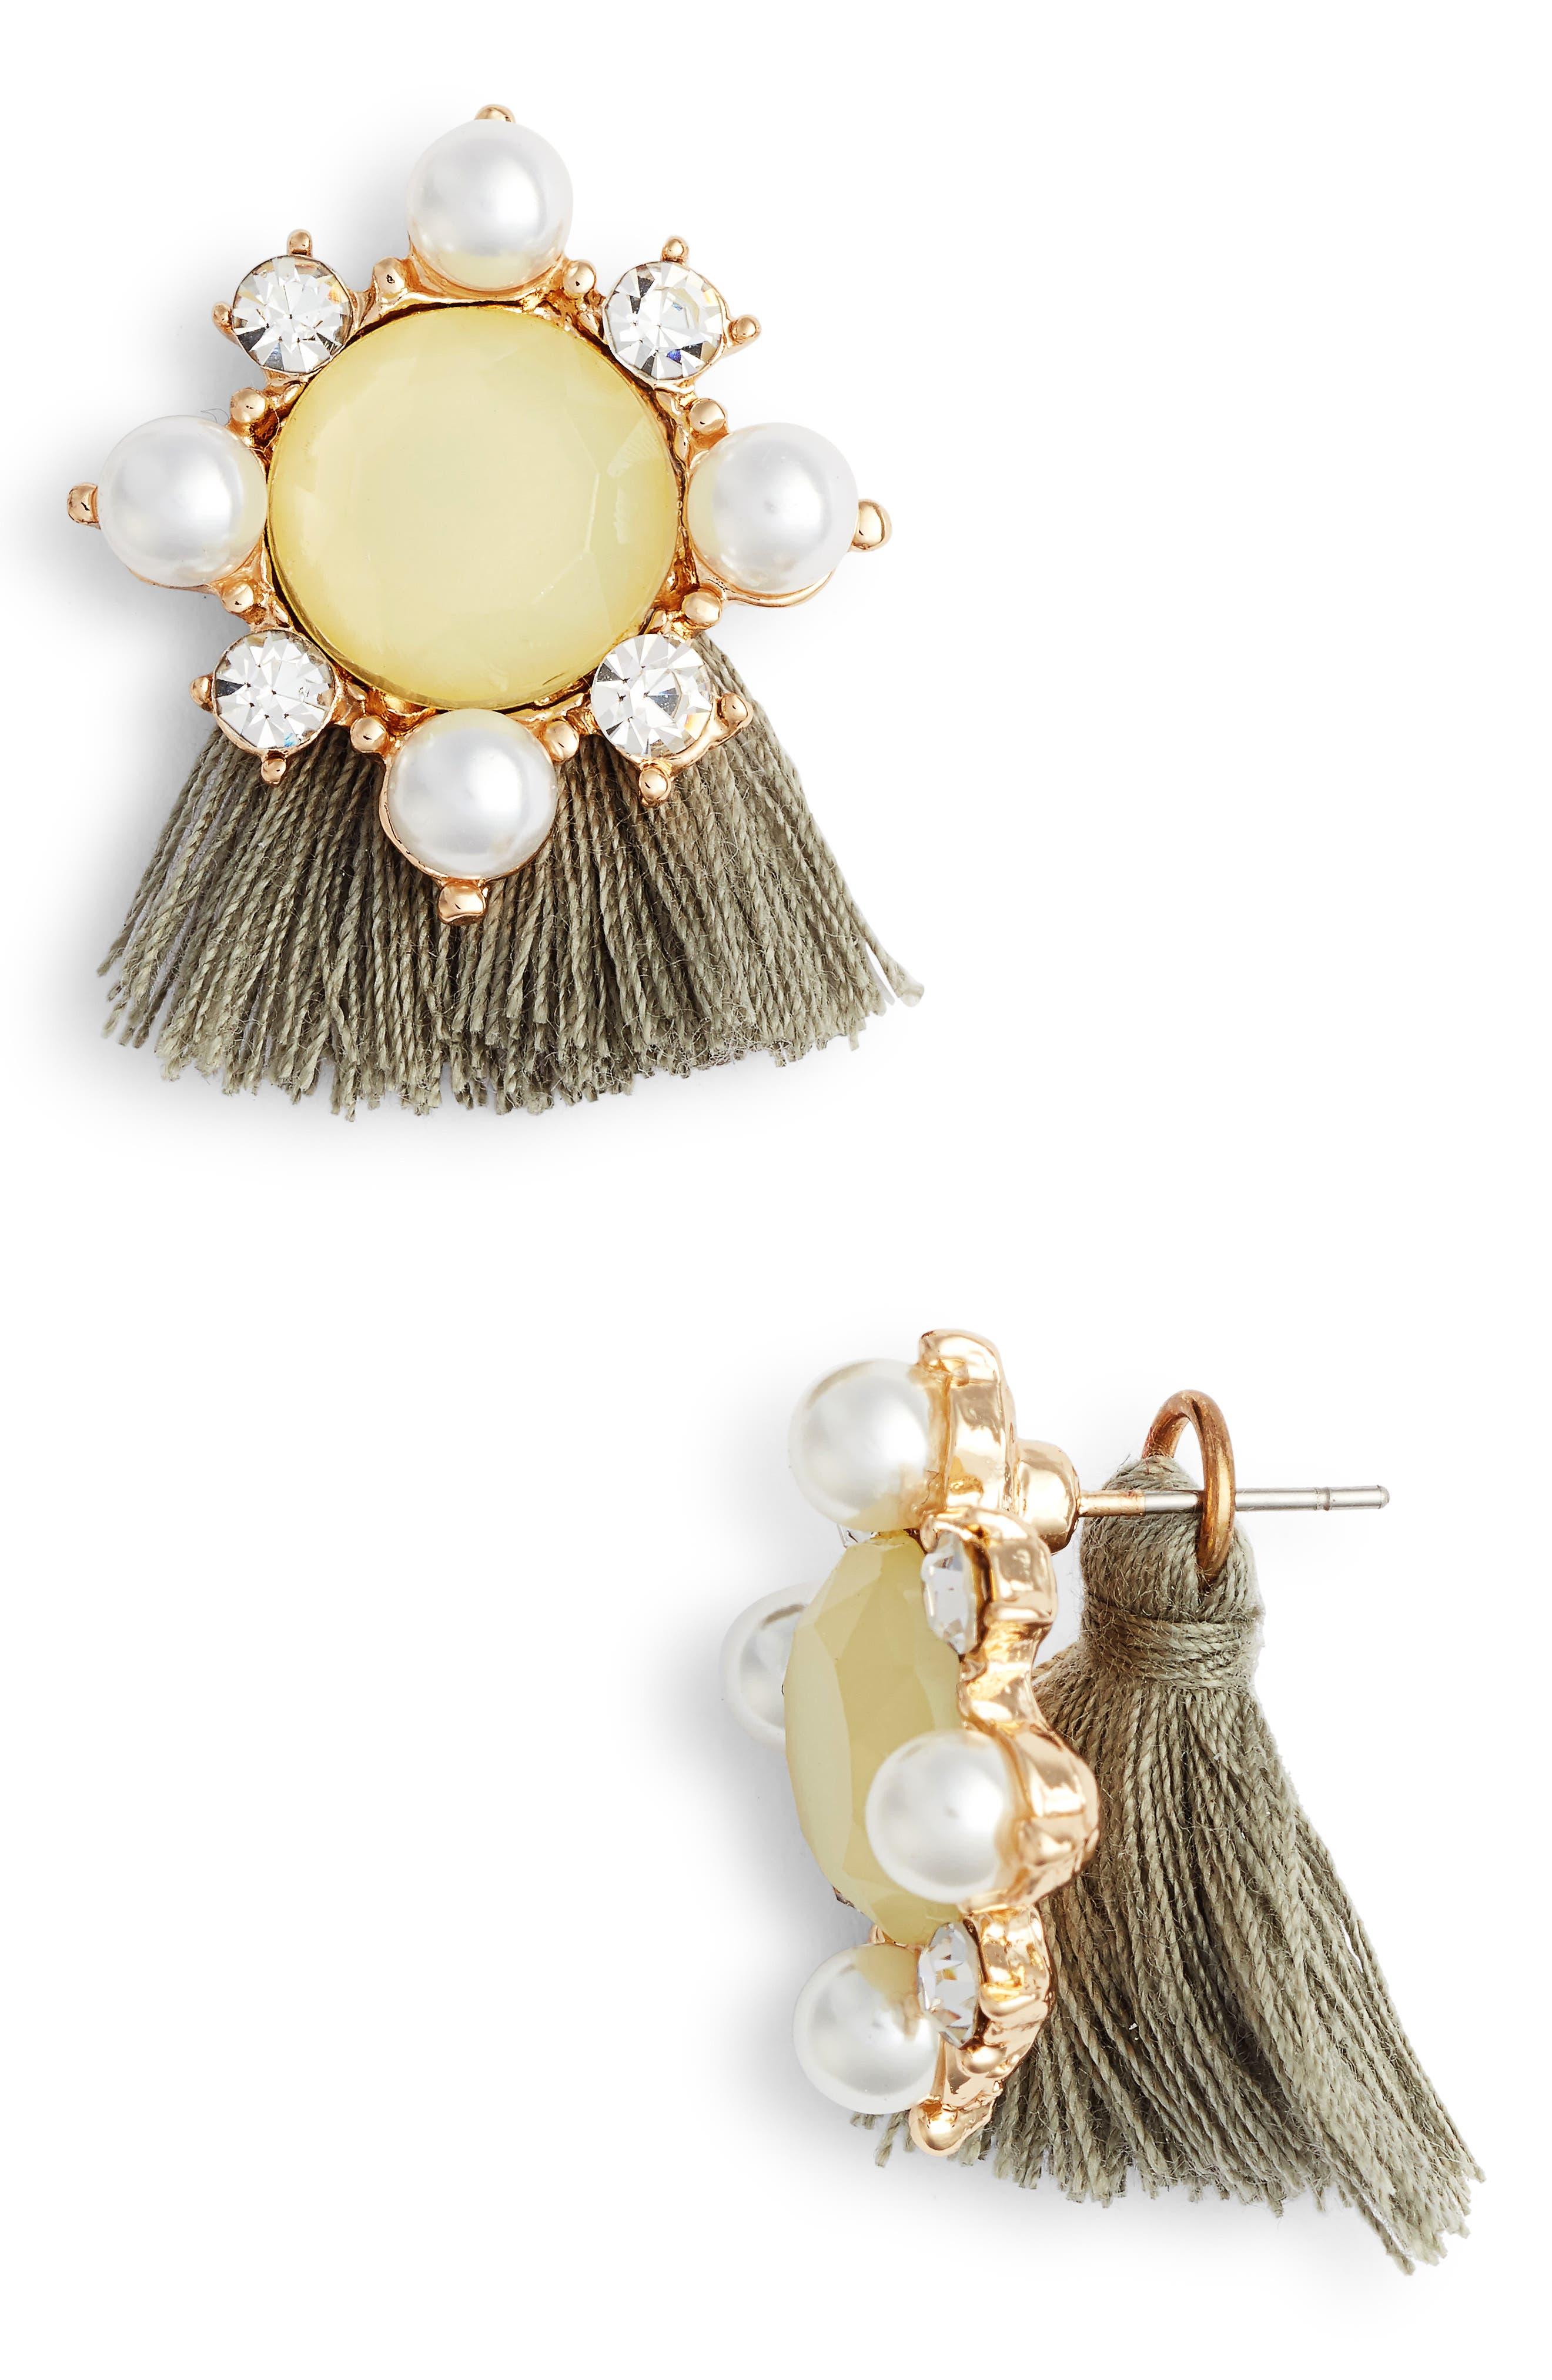 MAD JEWELS, Madeline Fringe Stud Earrings, Main thumbnail 1, color, 700